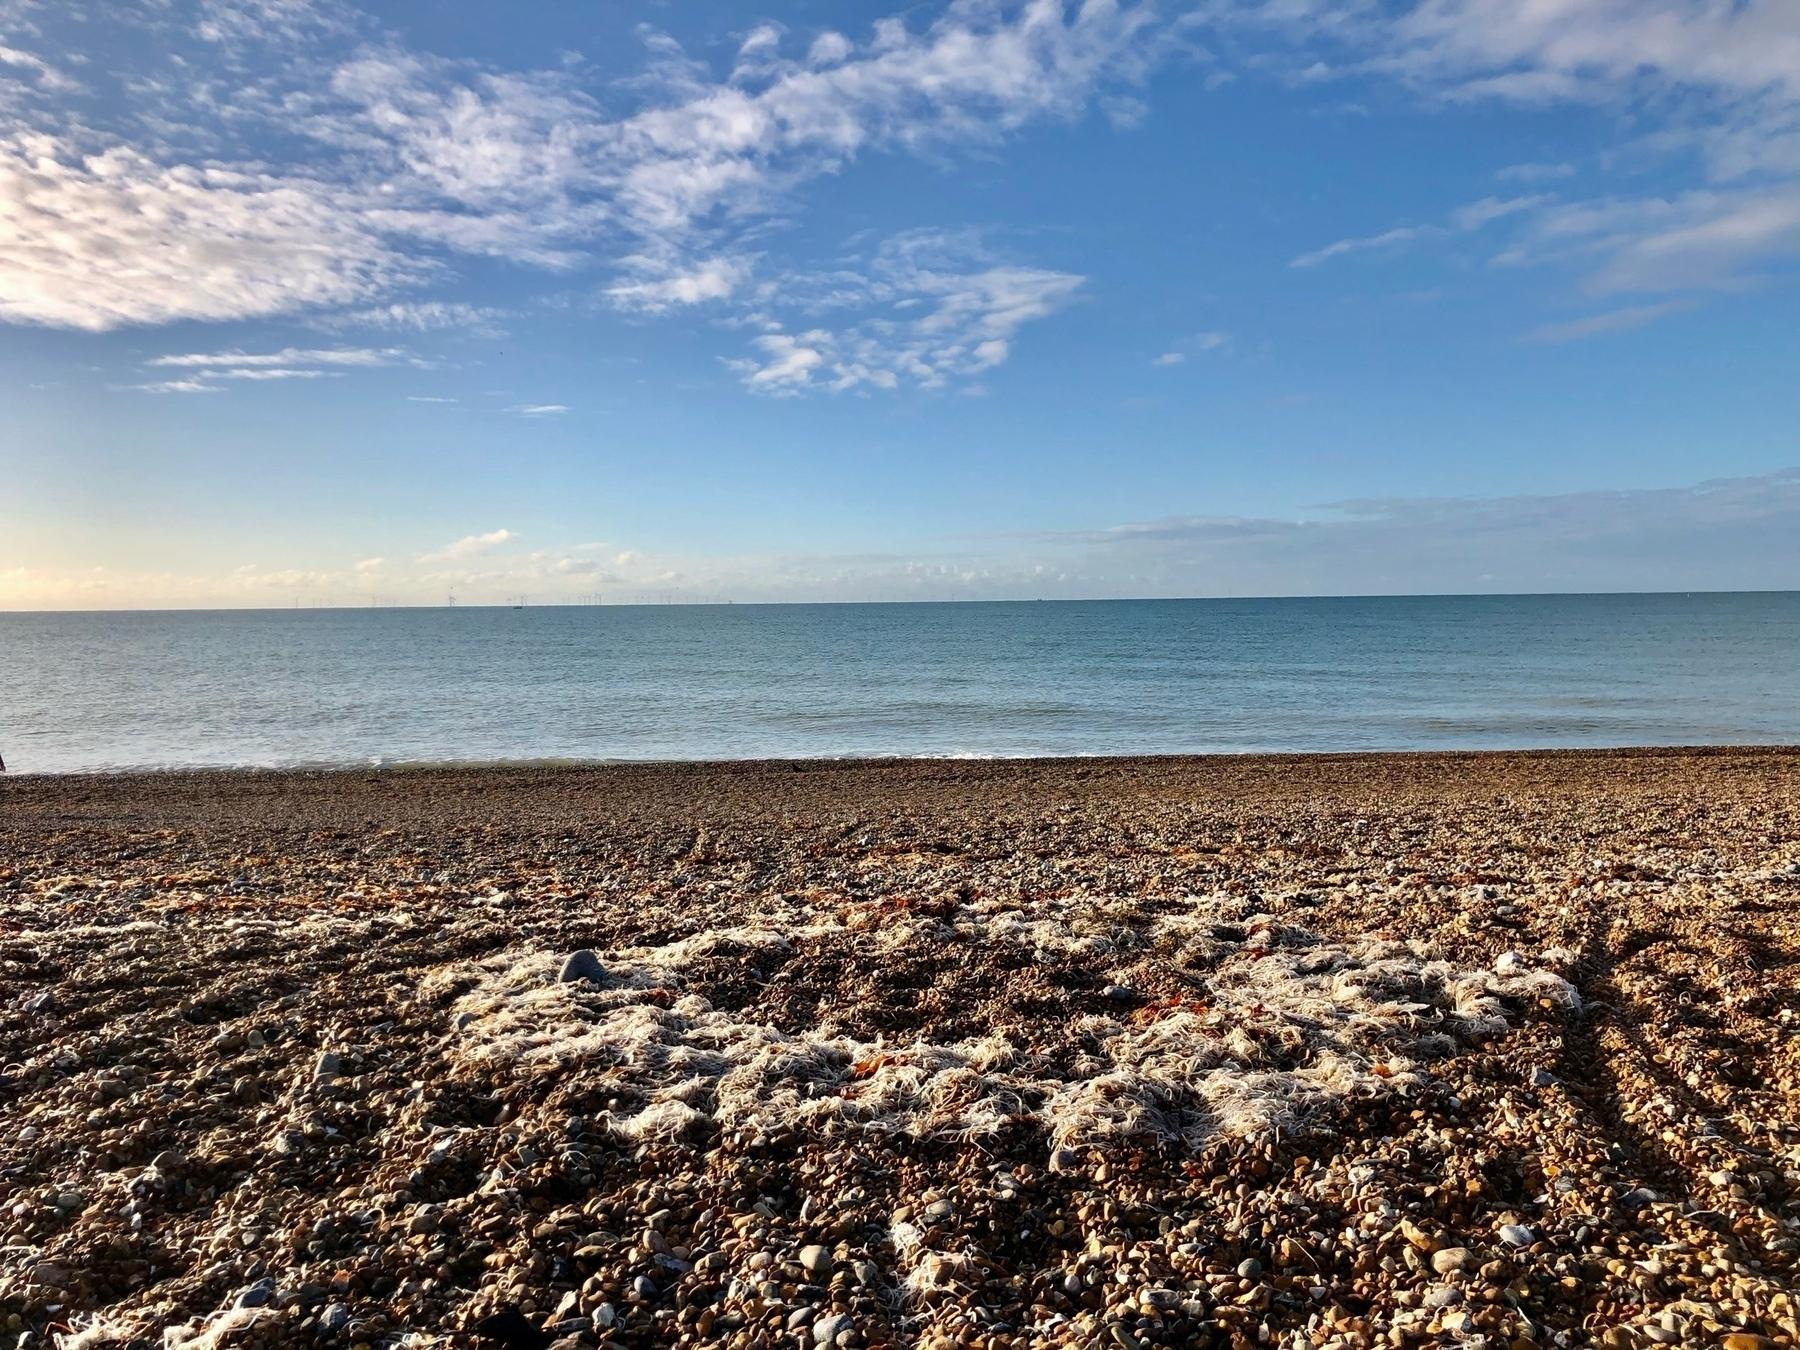 Shoreham Beach looking towards the sea.